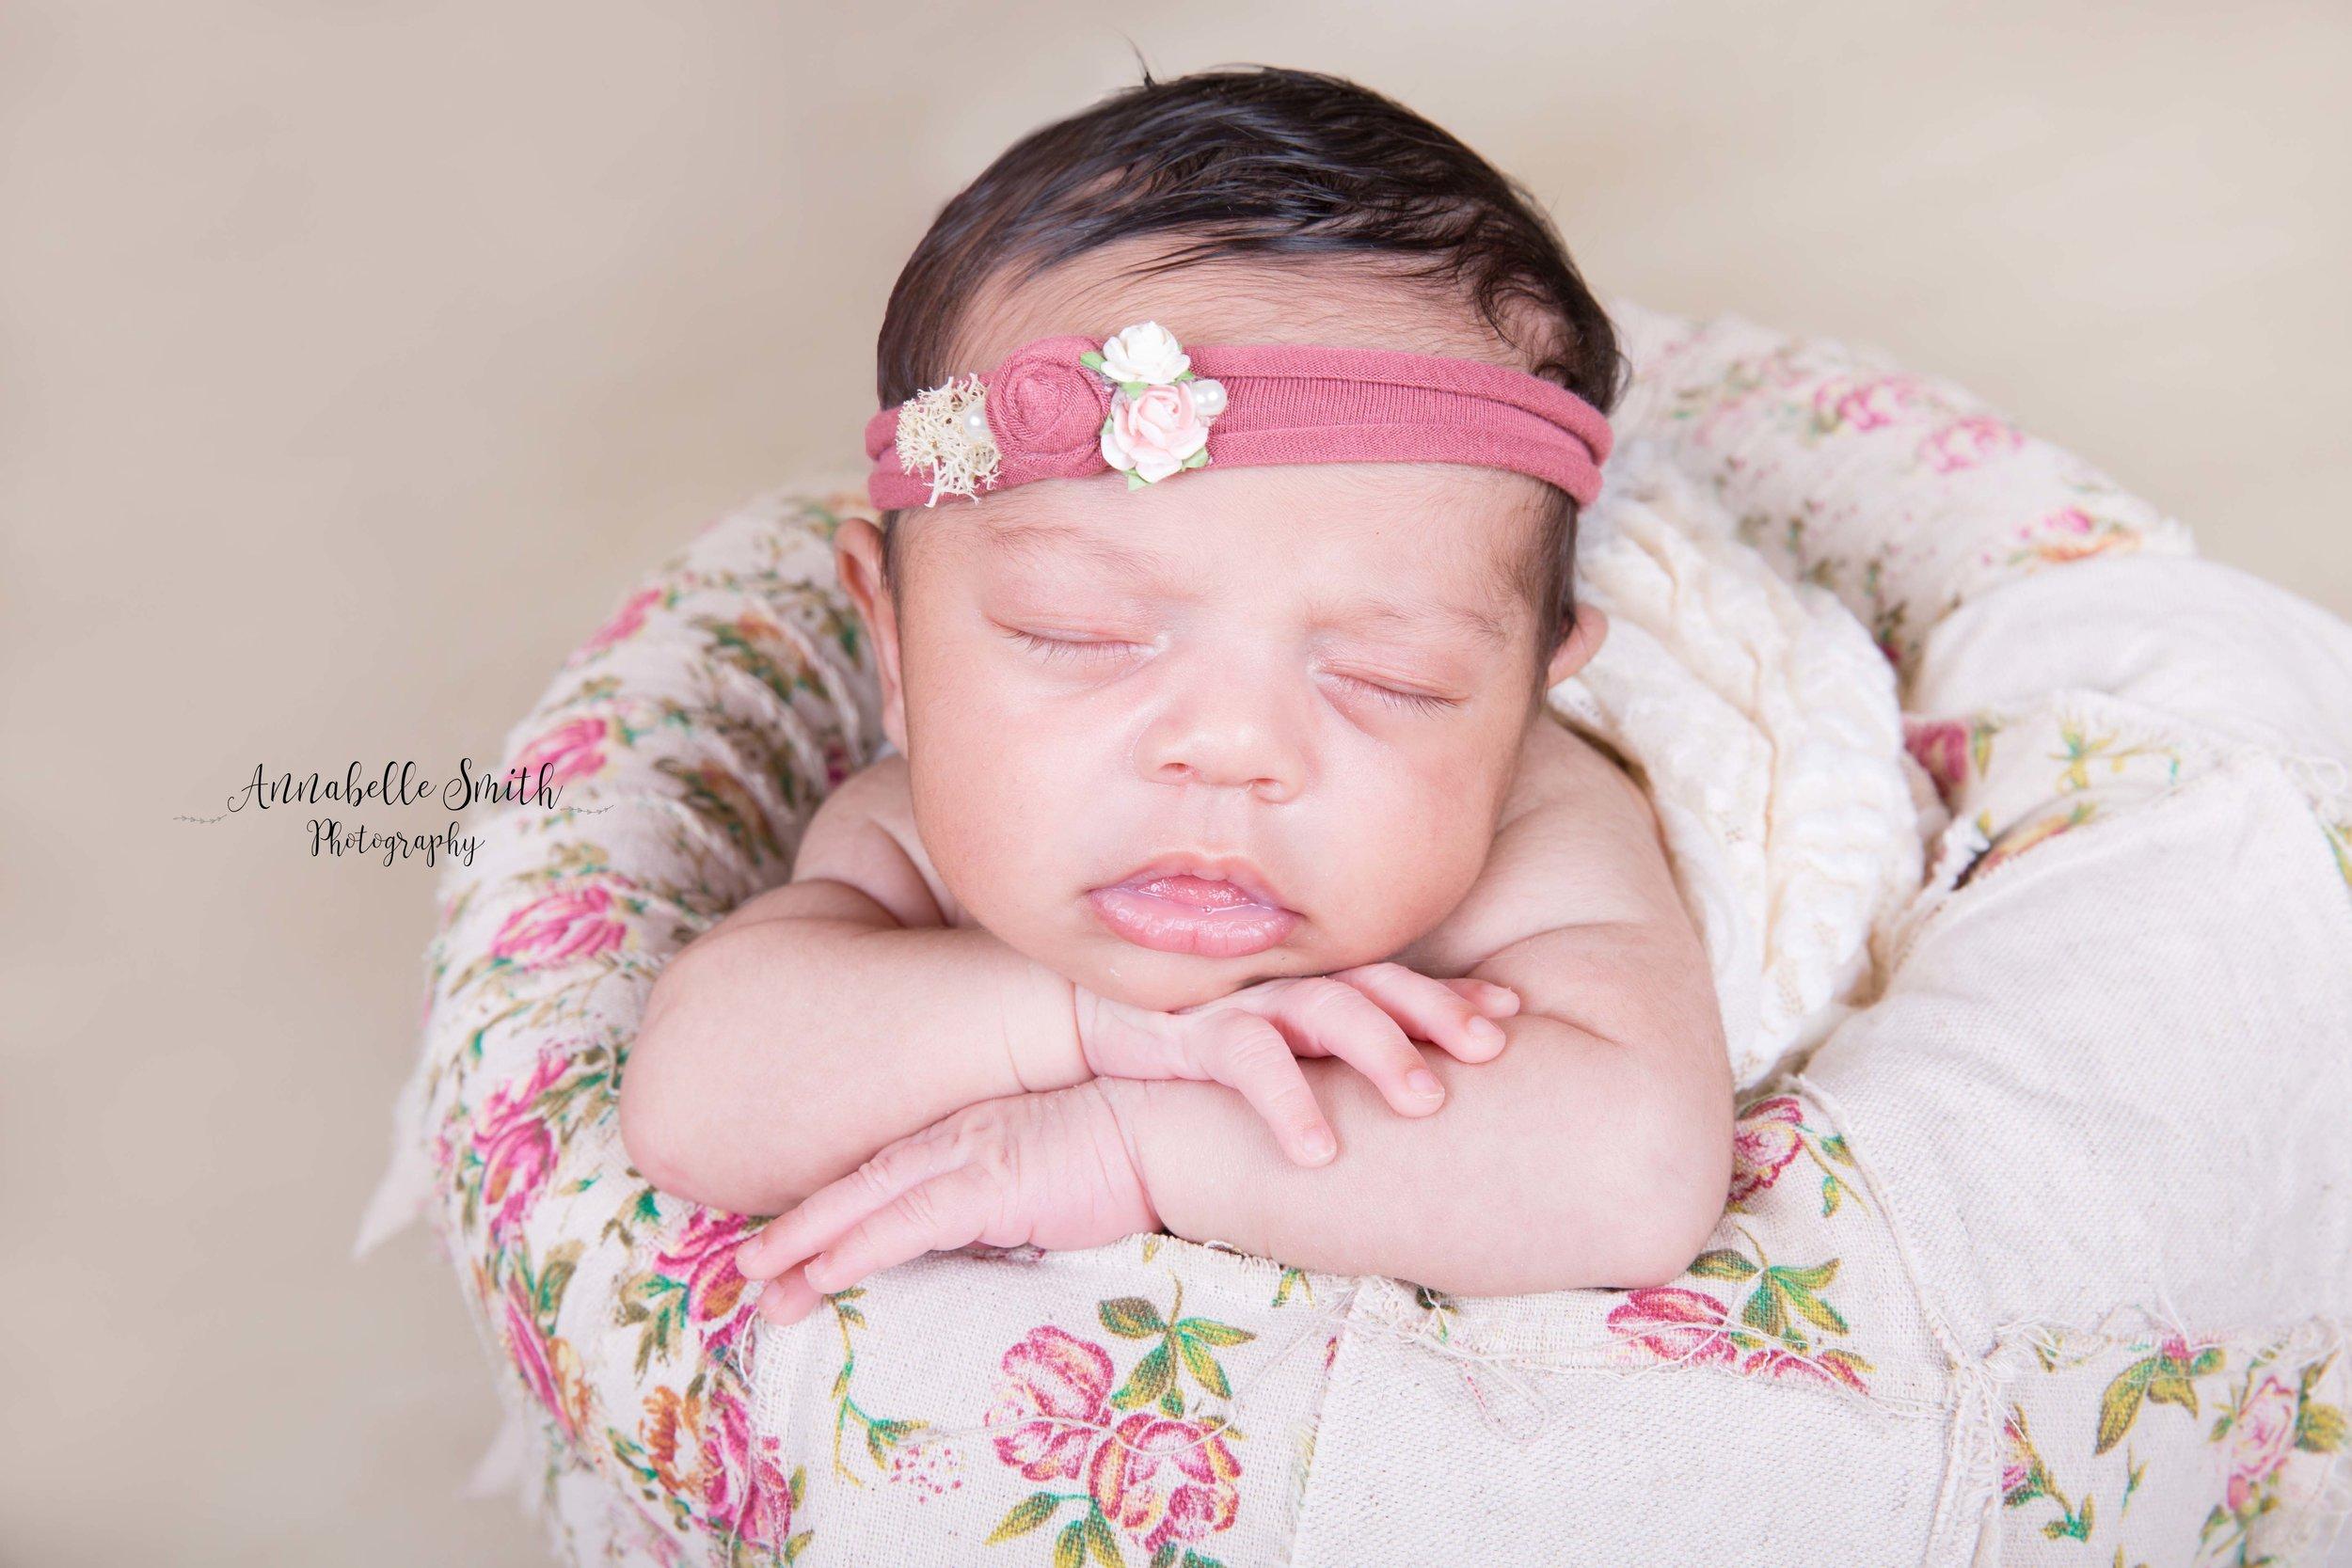 Annabelle smith photography newborn photography surrey.jpg